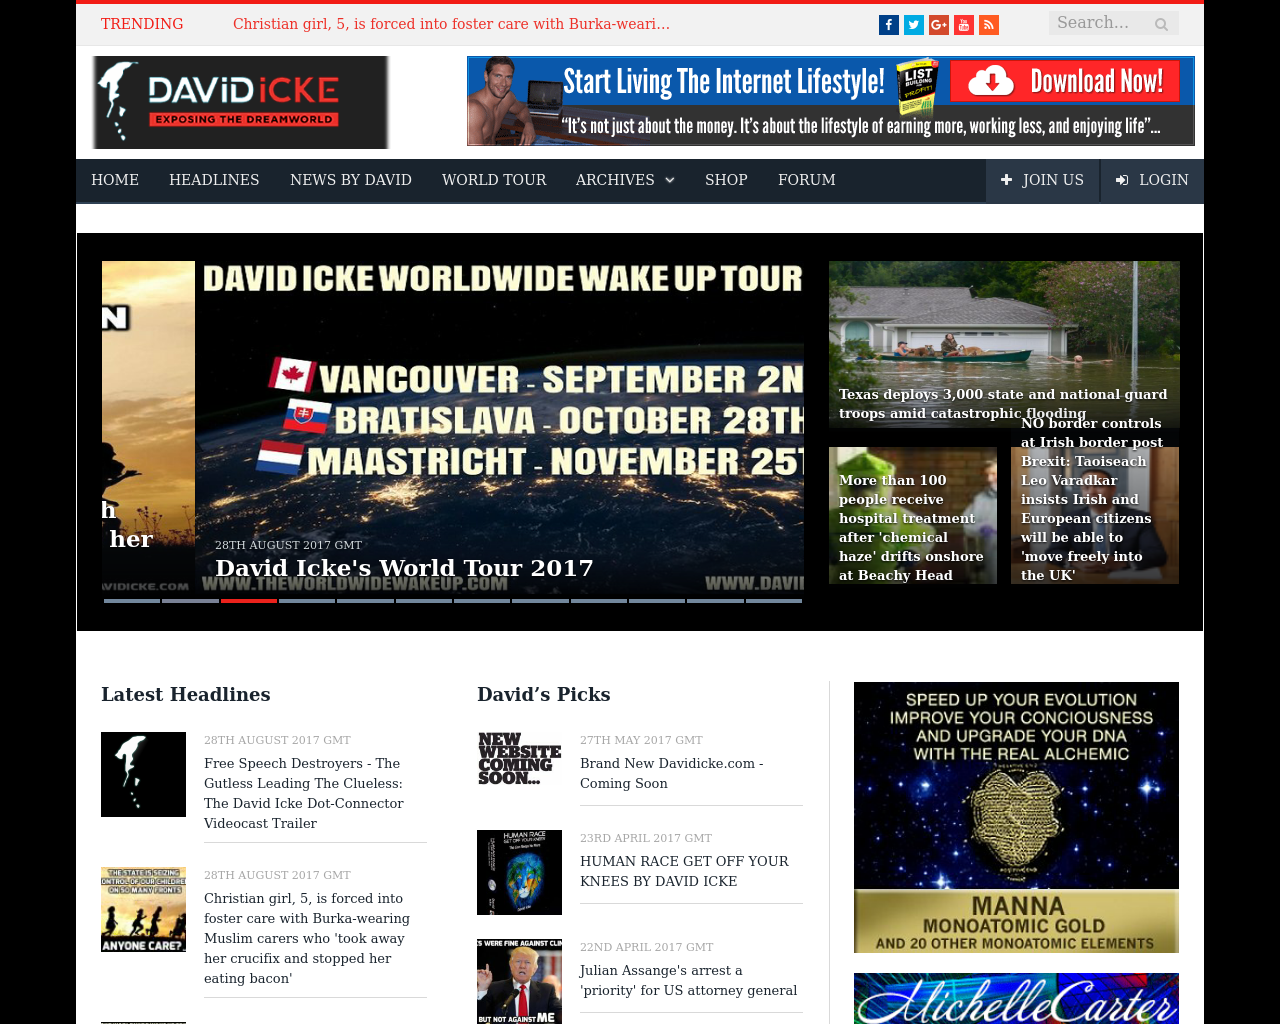 David-Icke-Advertising-Reviews-Pricing